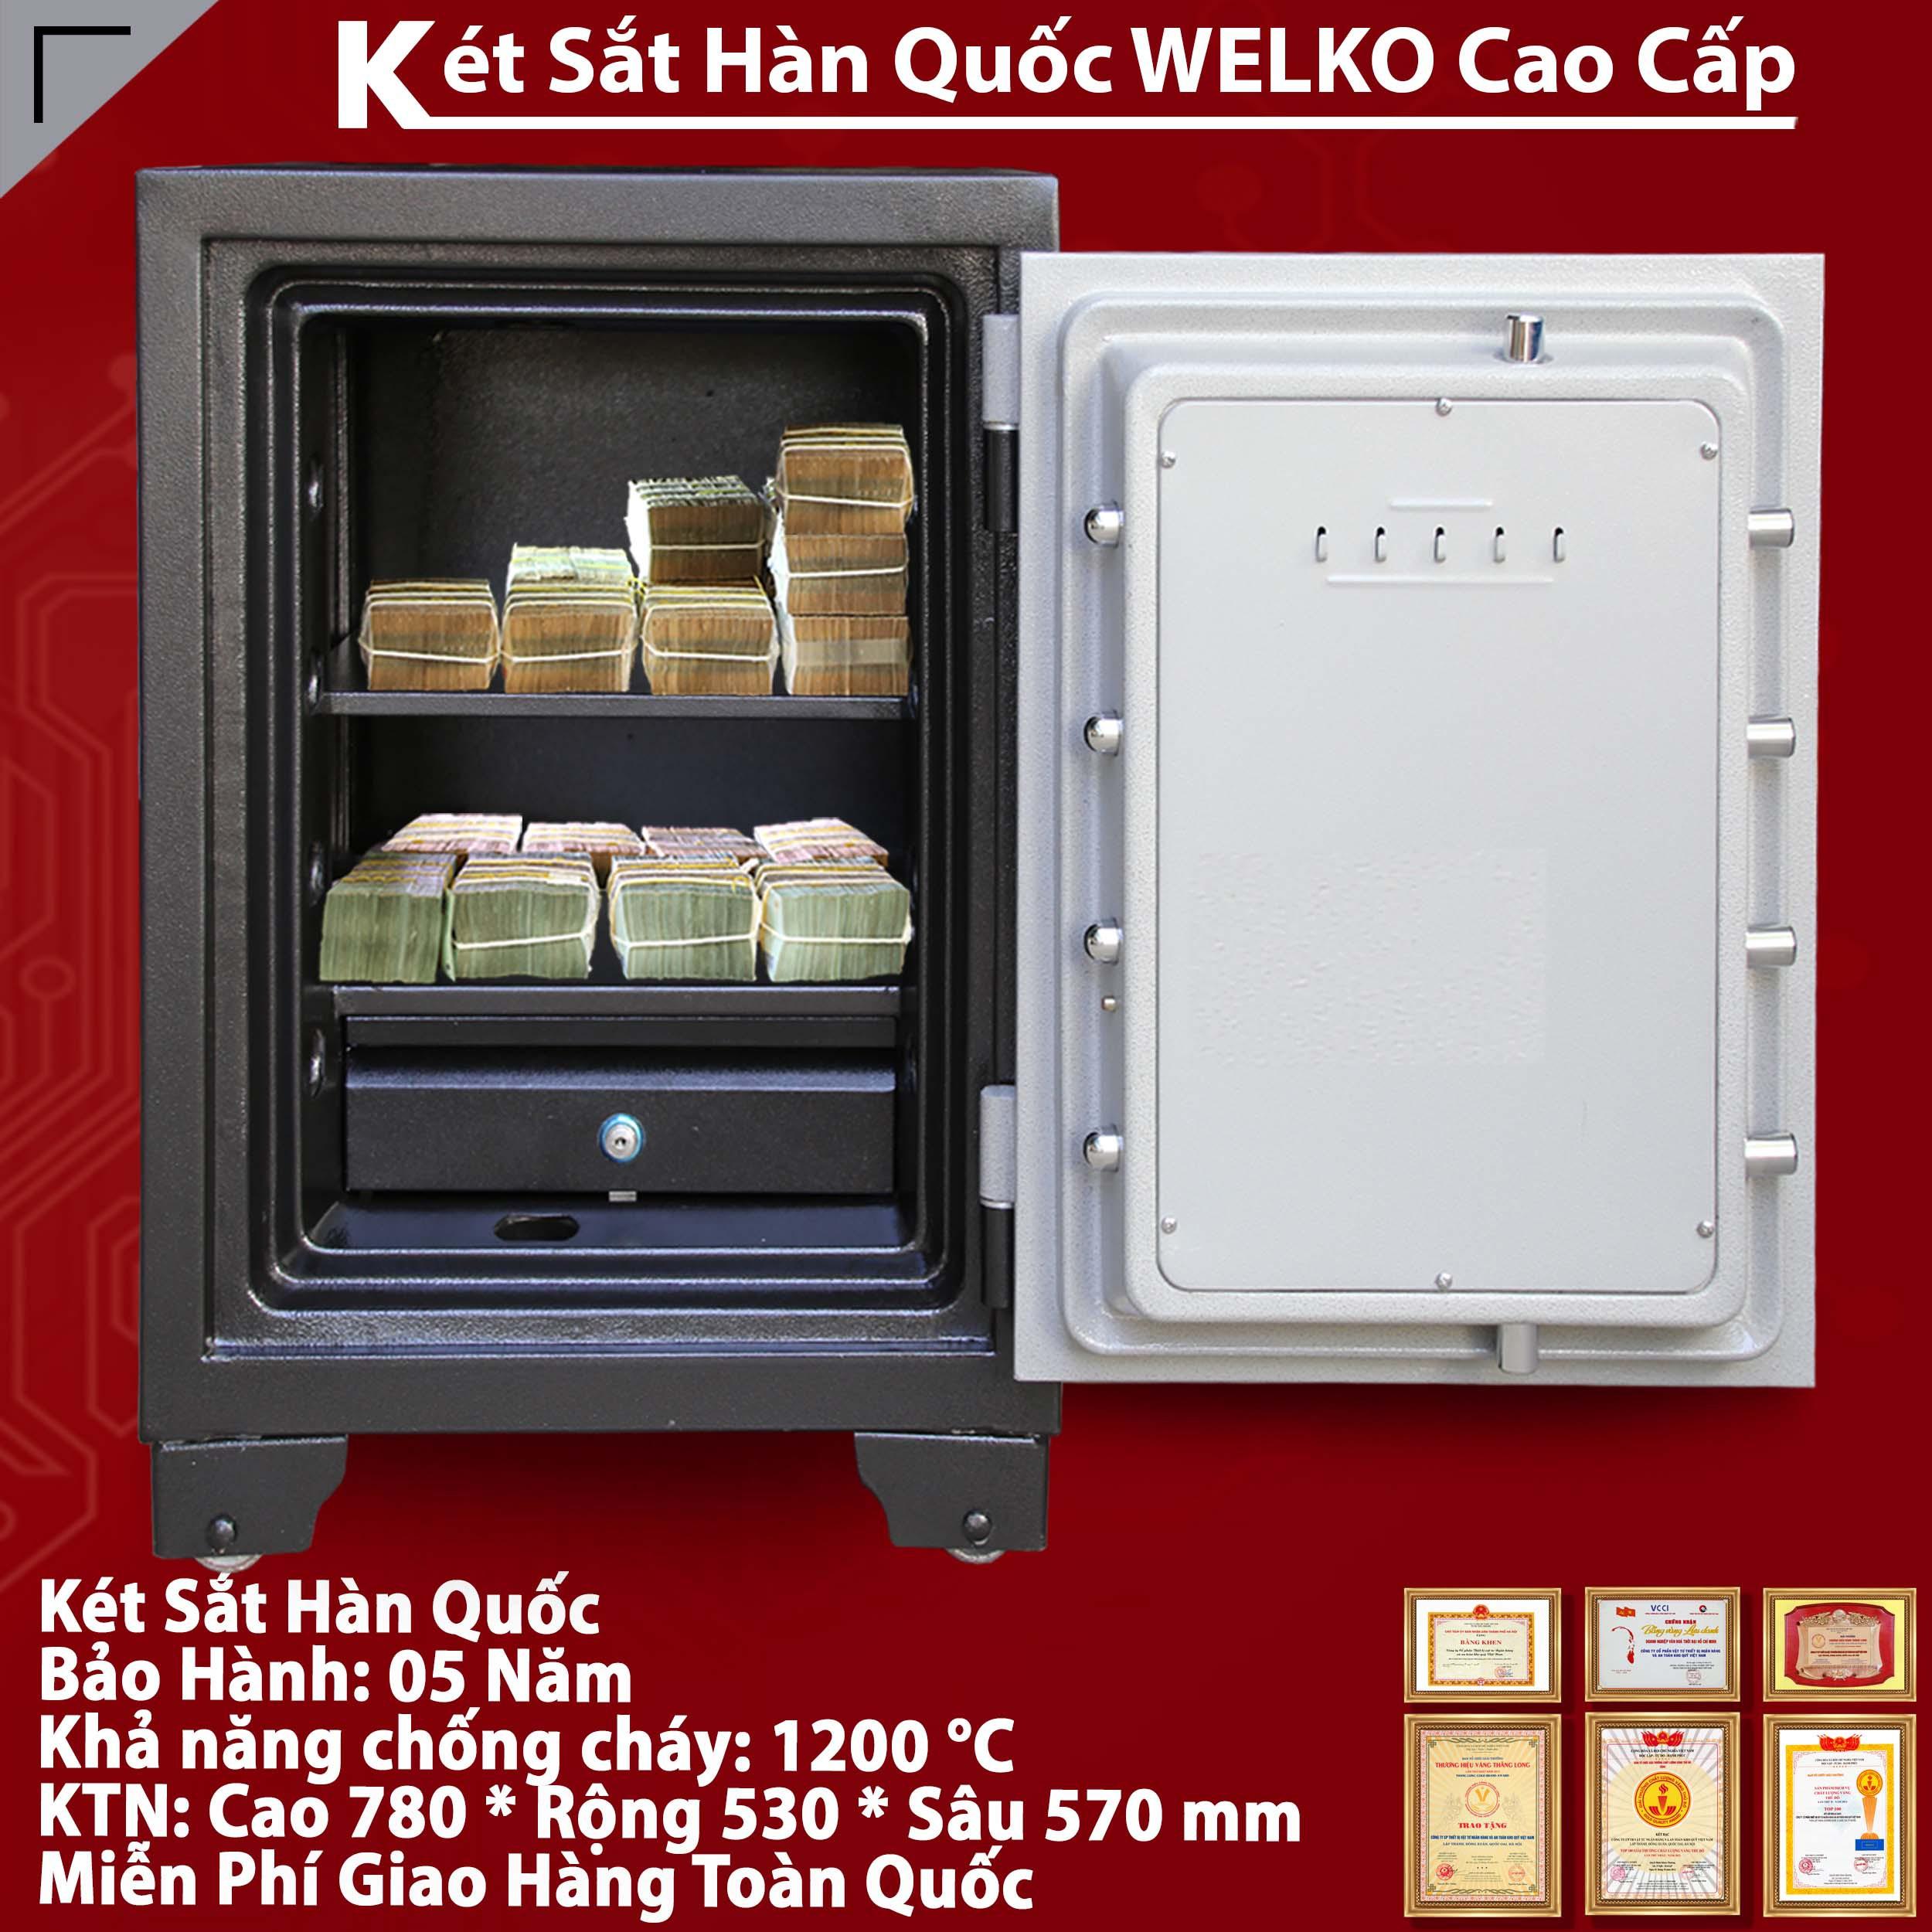 Két Sắt Văn Phòng S780 - KC